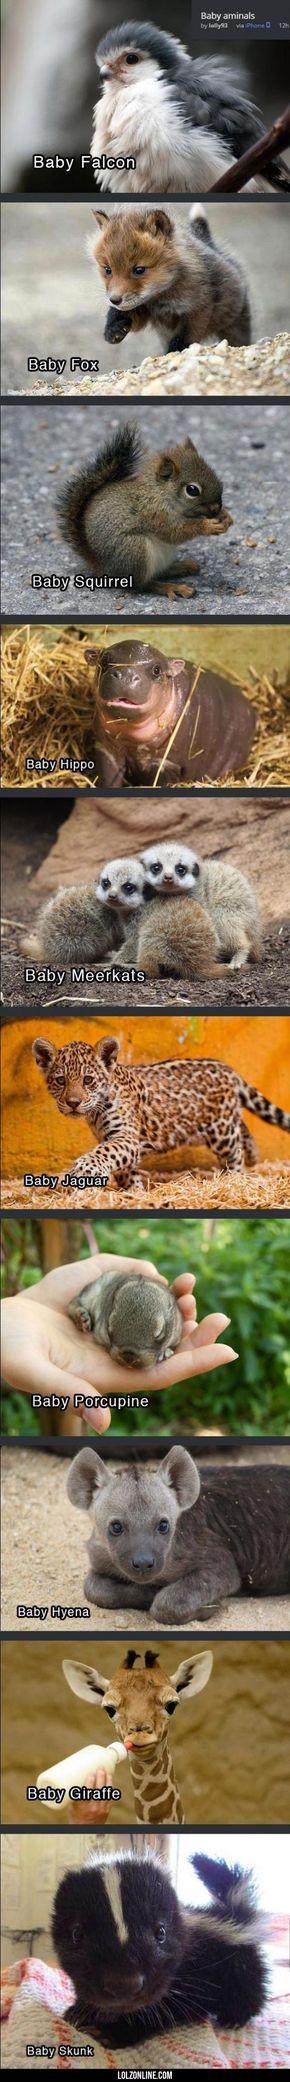 Baby animals#funny #lol #lolzonline